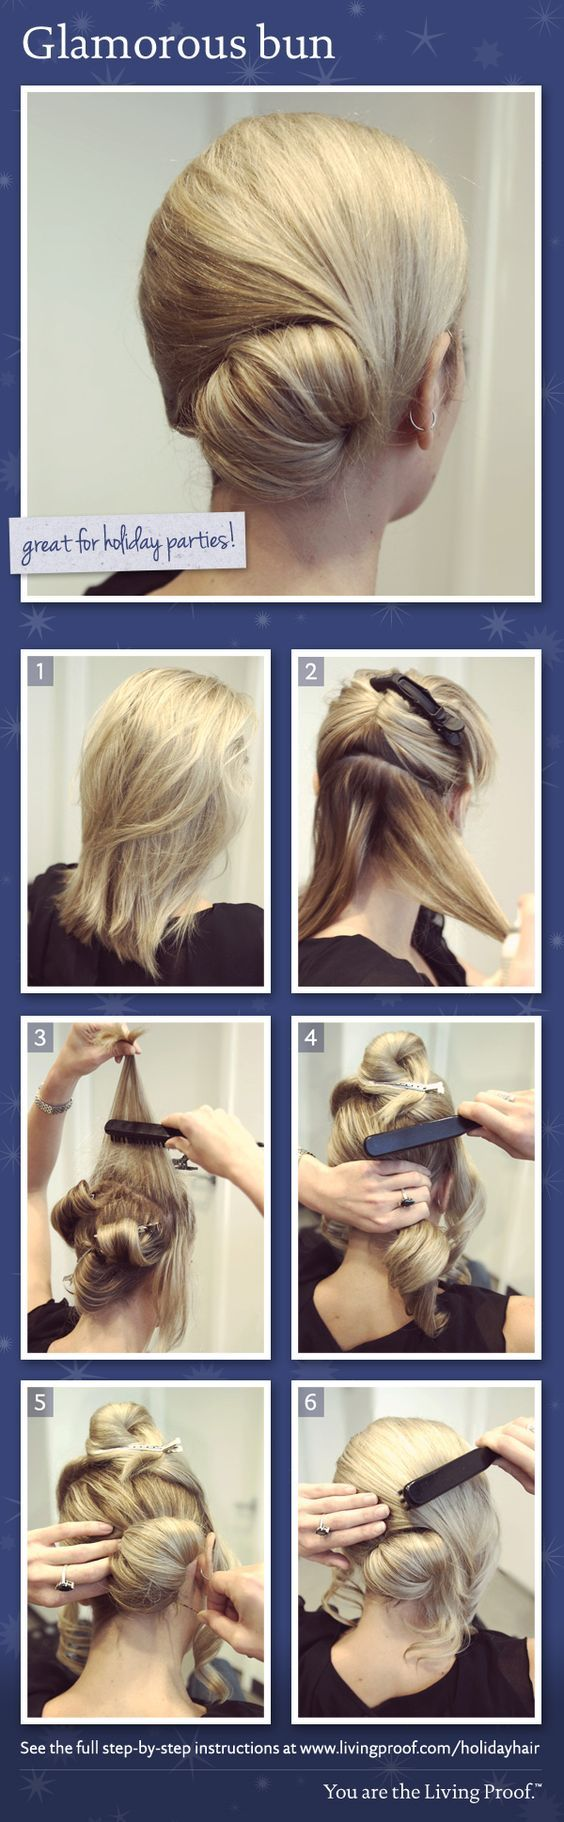 19 Easy Hair Tutorials for Summer 2016